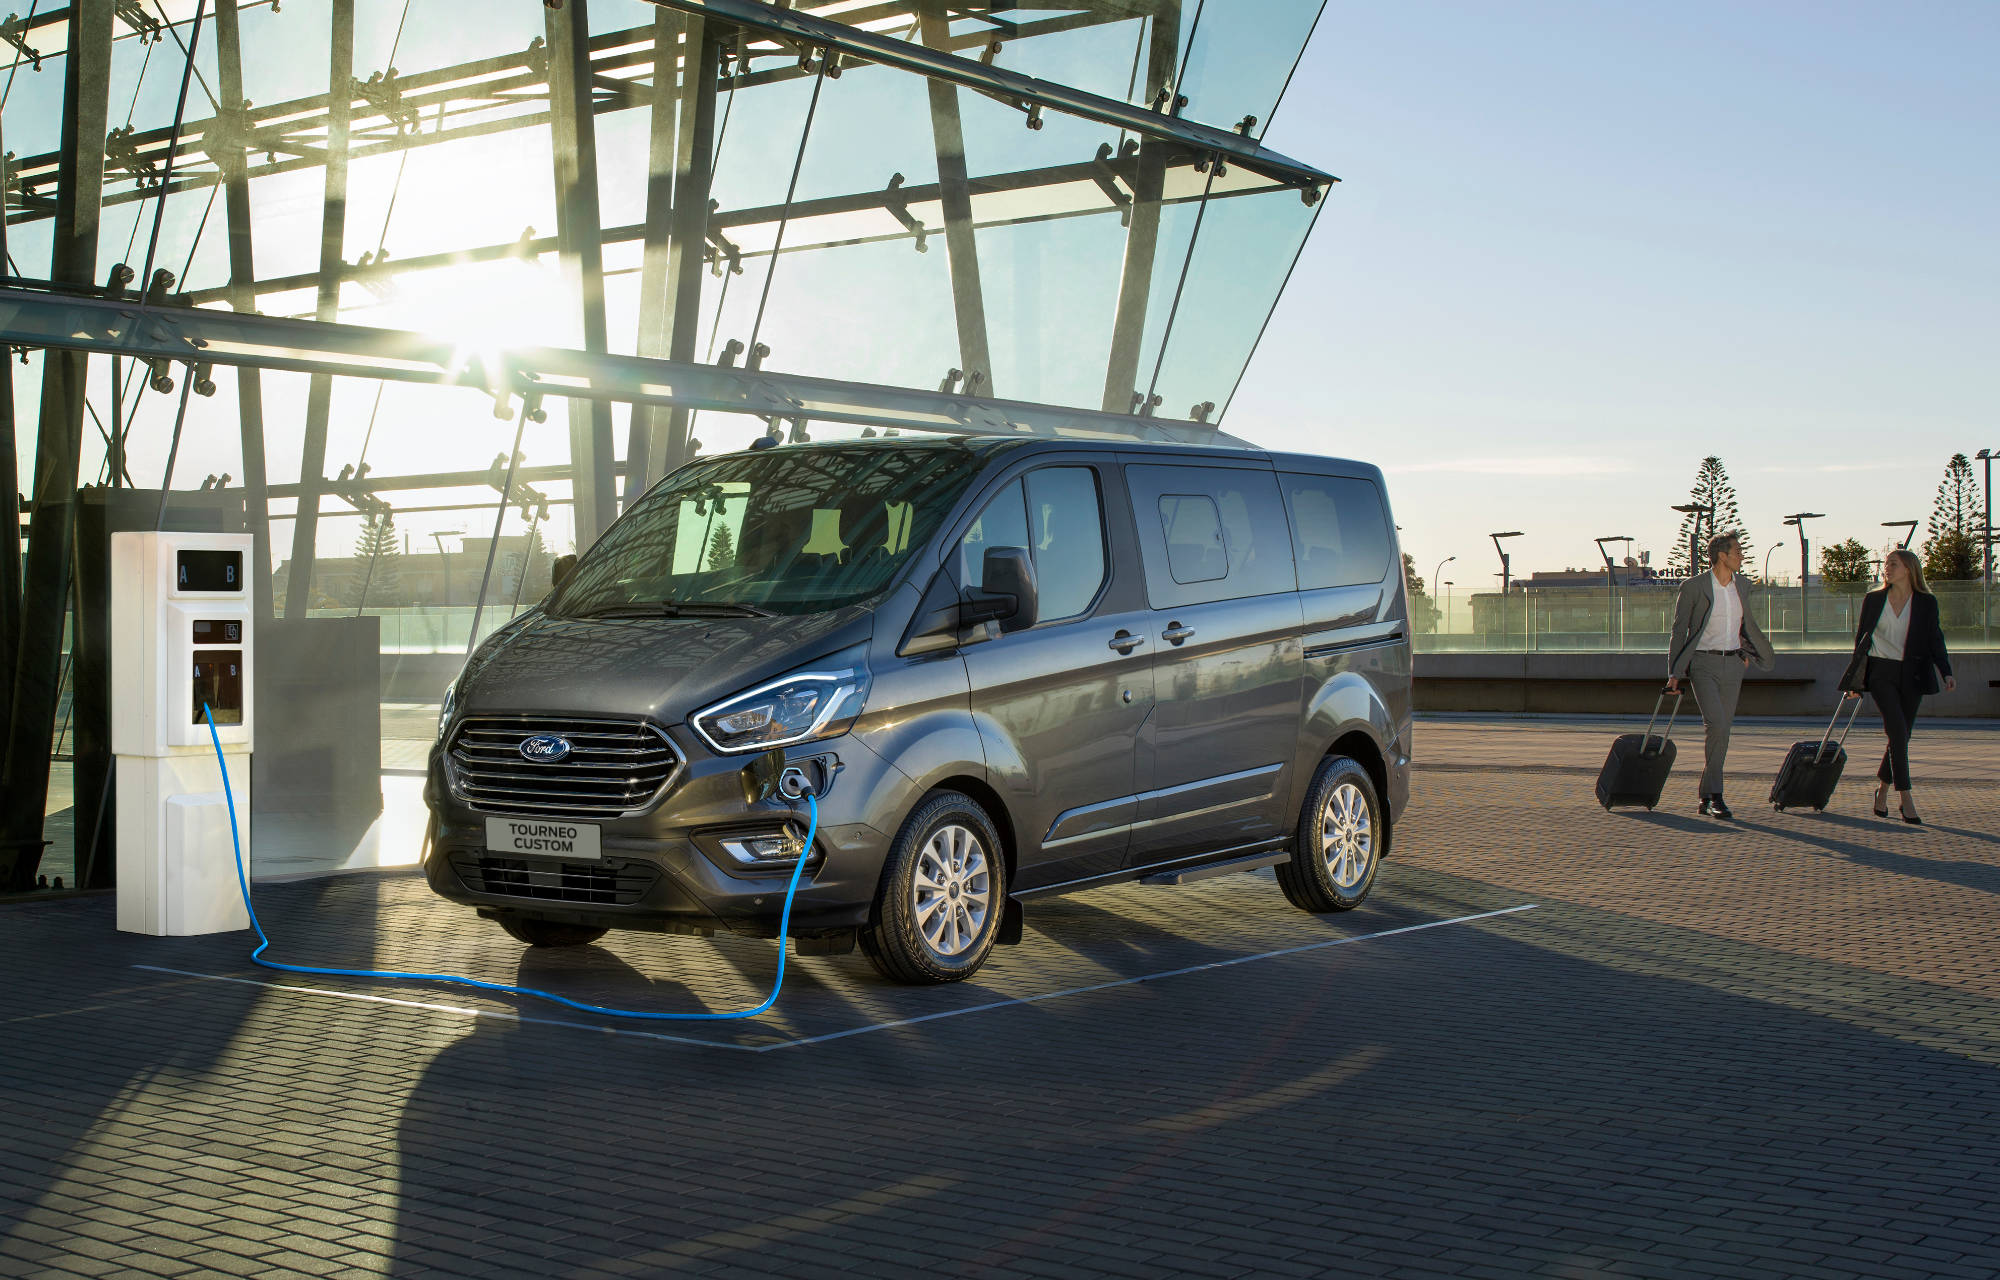 Ford Tourneo Custom PHEV & MHEV